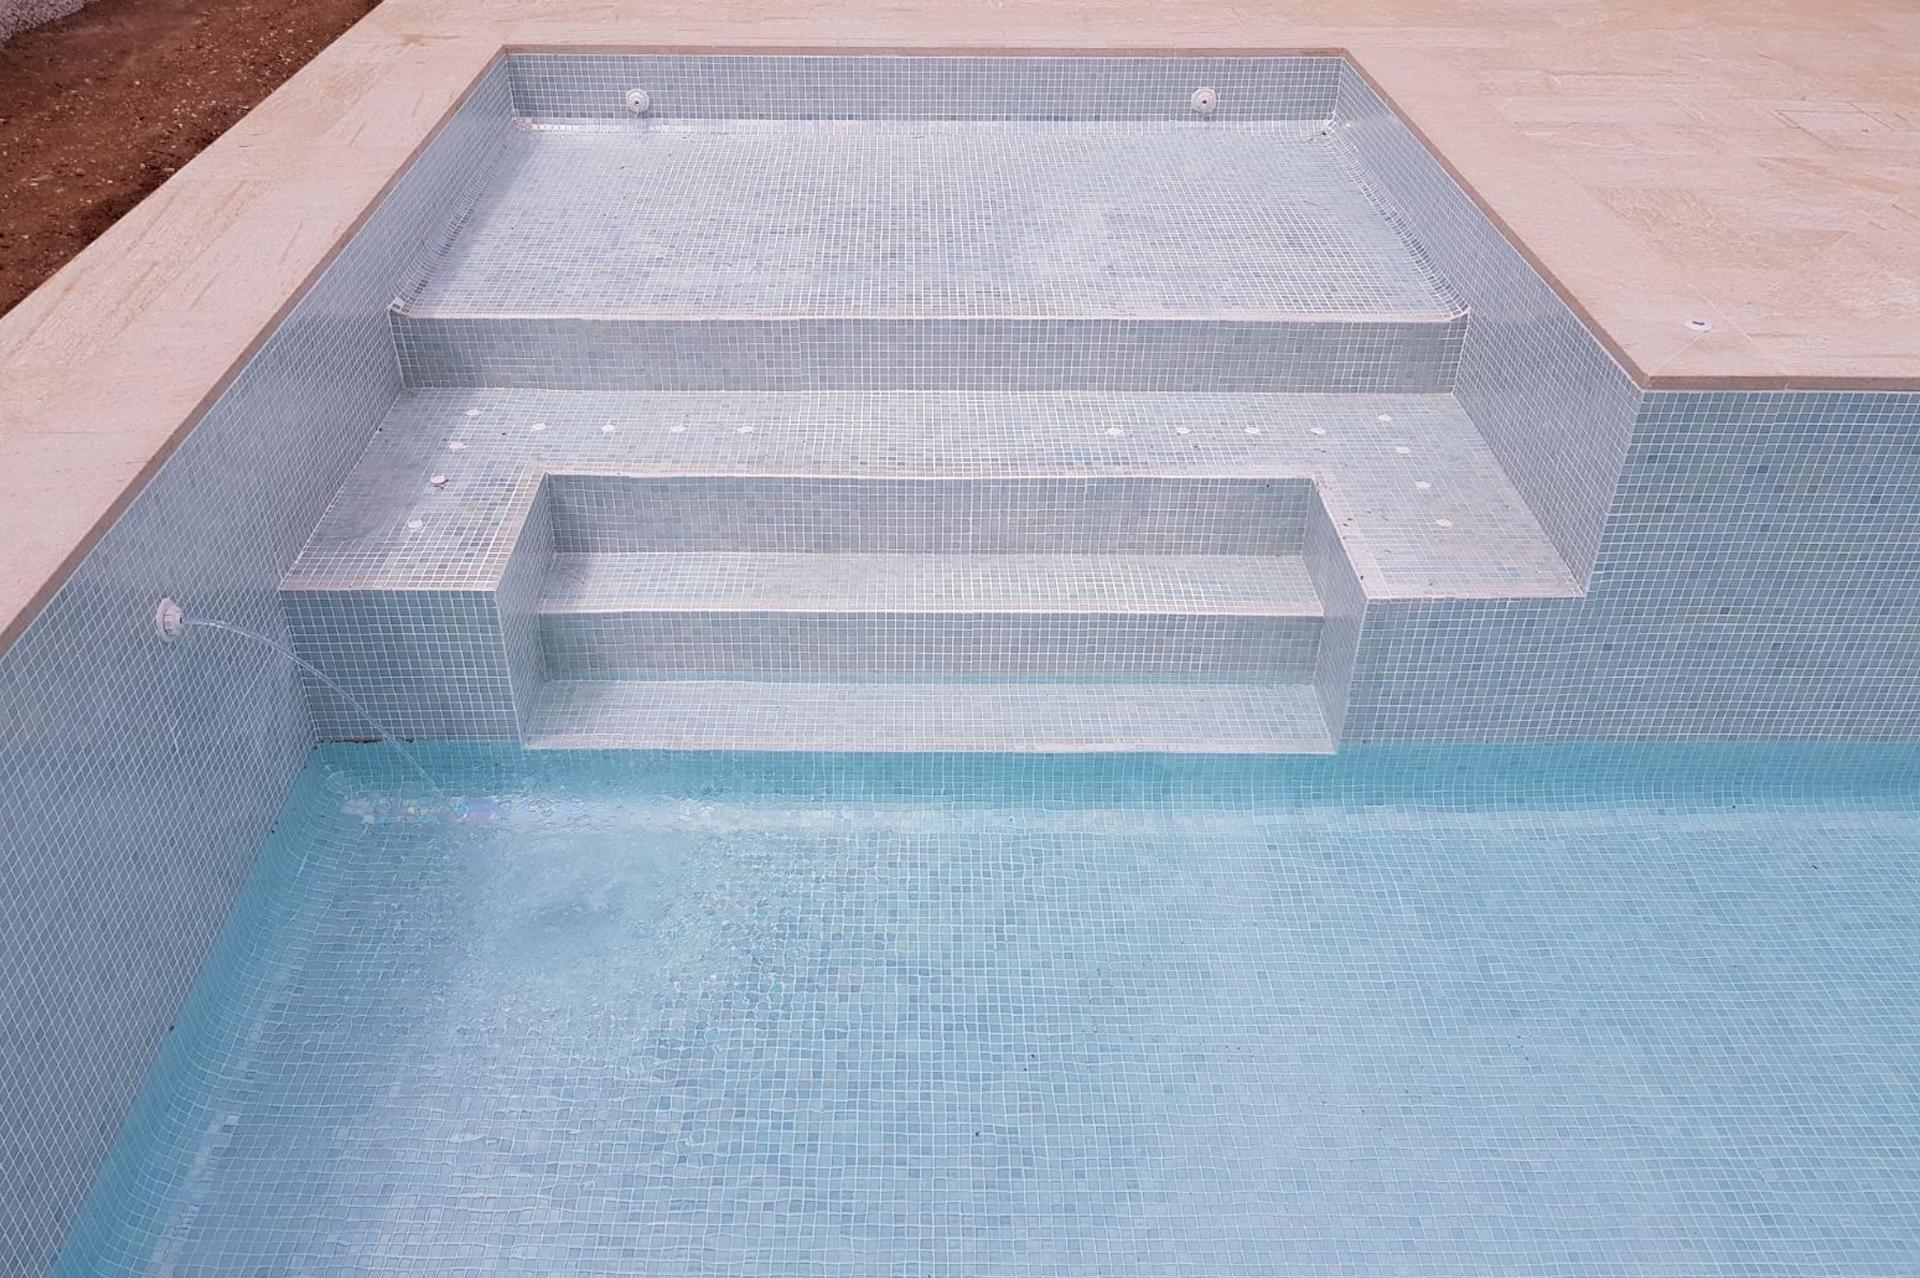 reforma_piscina_1_2